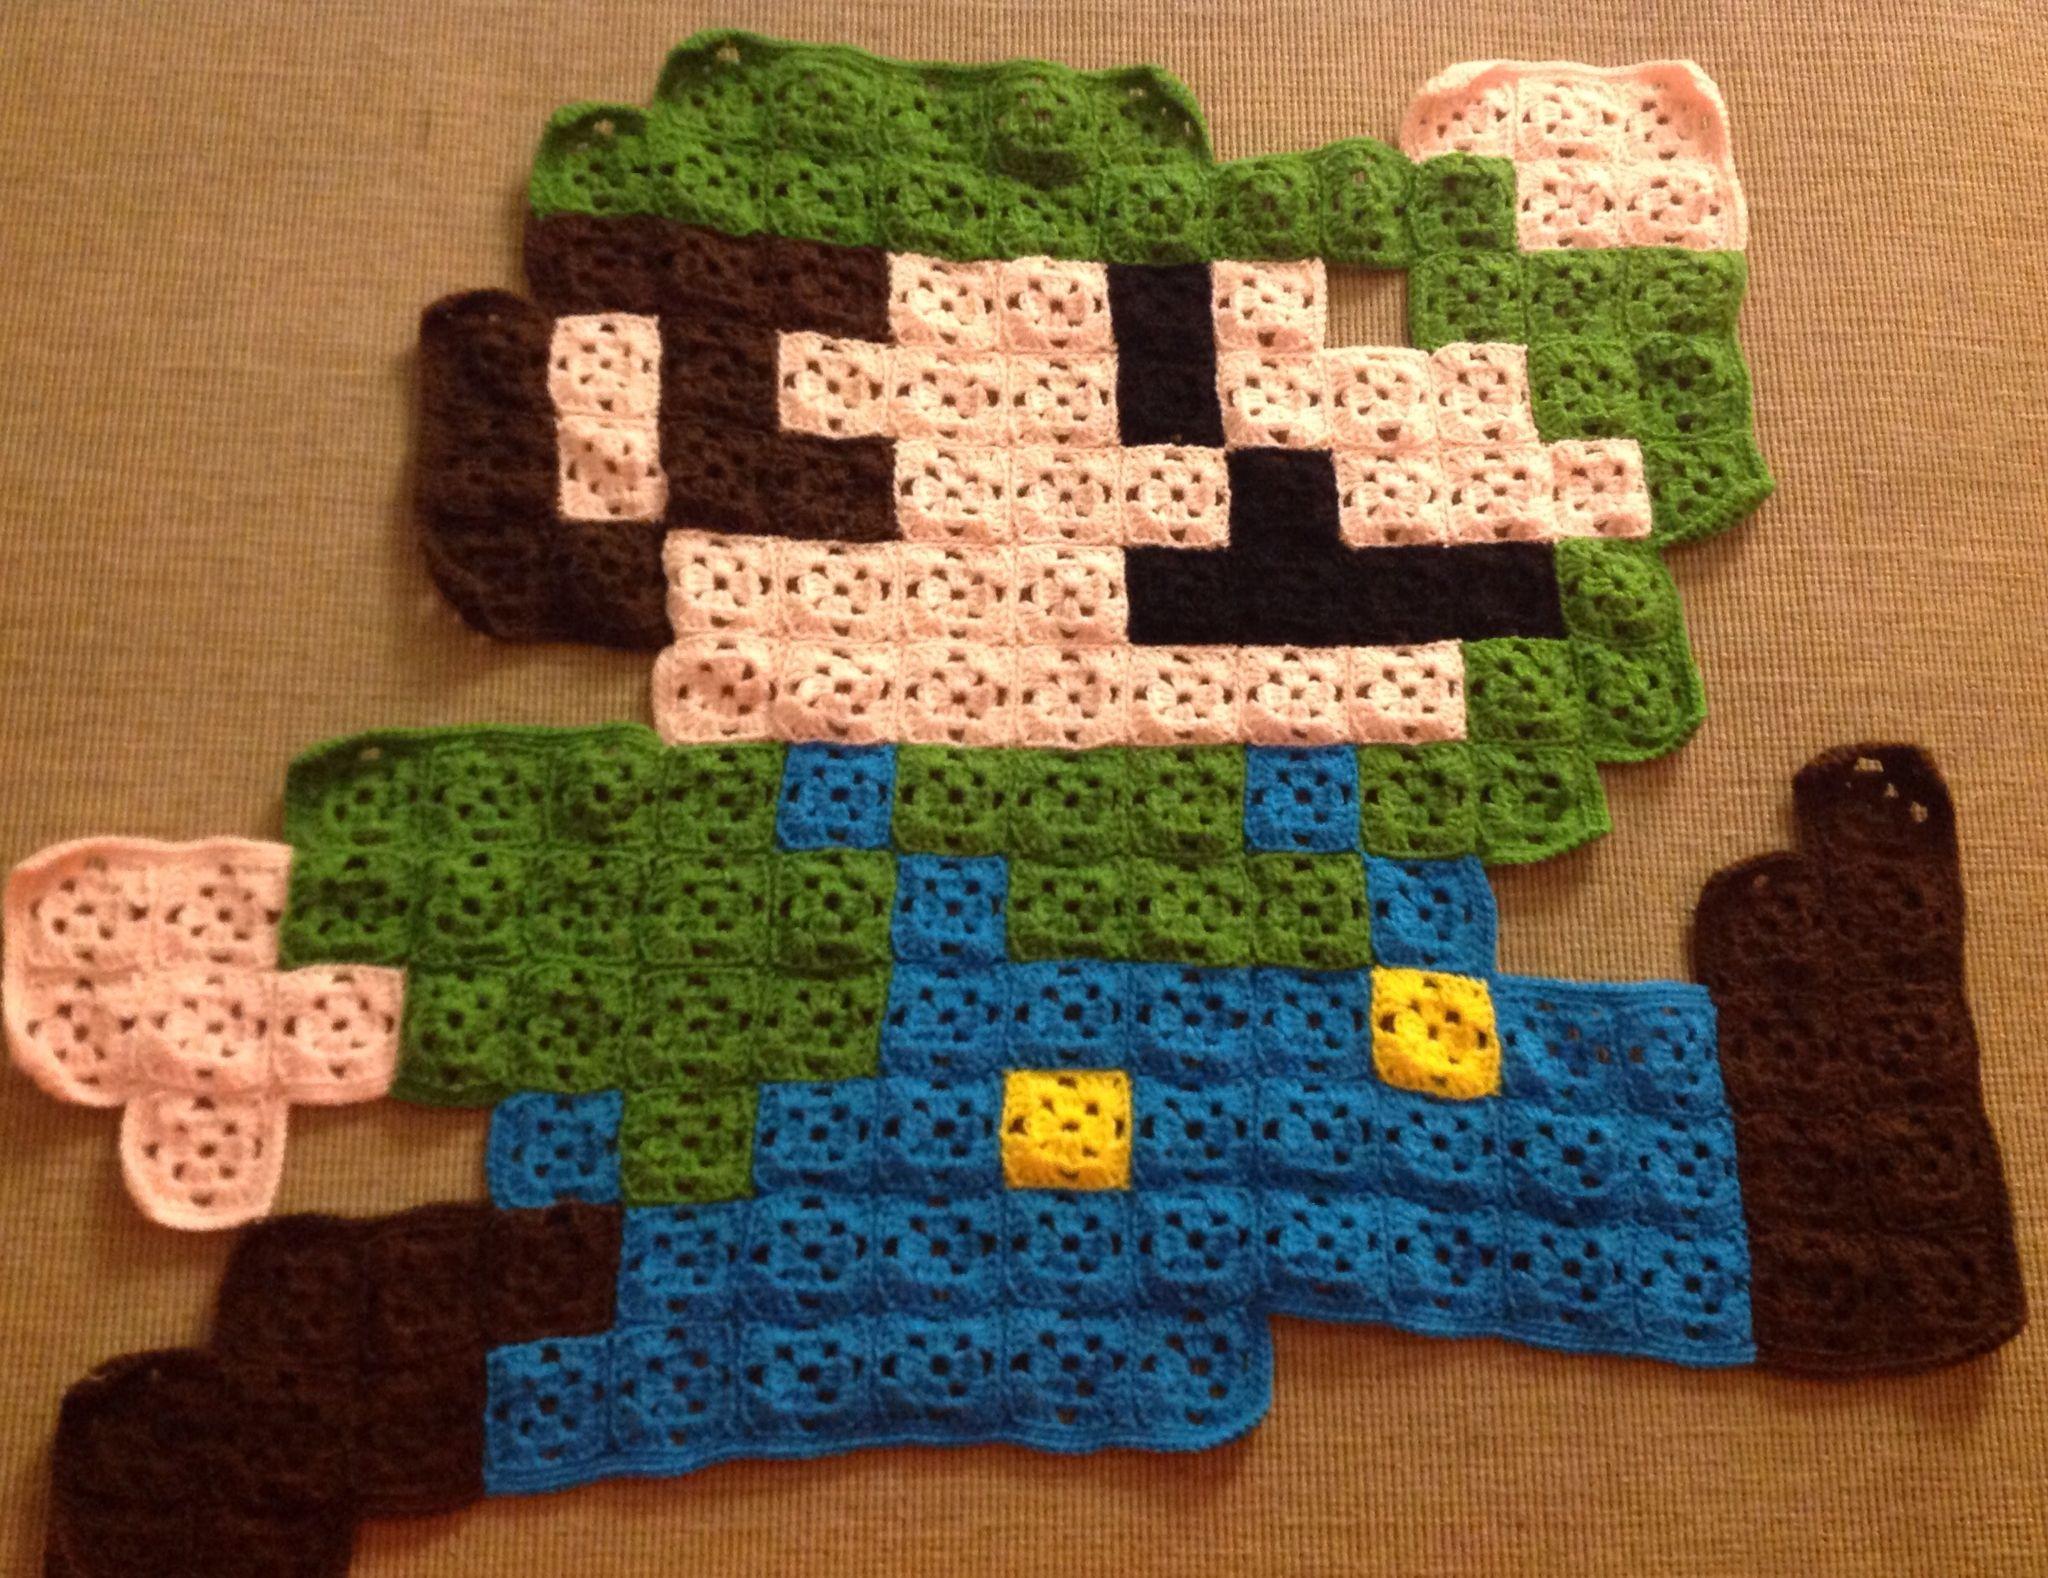 Super Mario Crochet Blankets Blanket And Yarns T Chevron Pattern Diagram Mantas Pinterest Custom Order Luigi From Bros 8bit